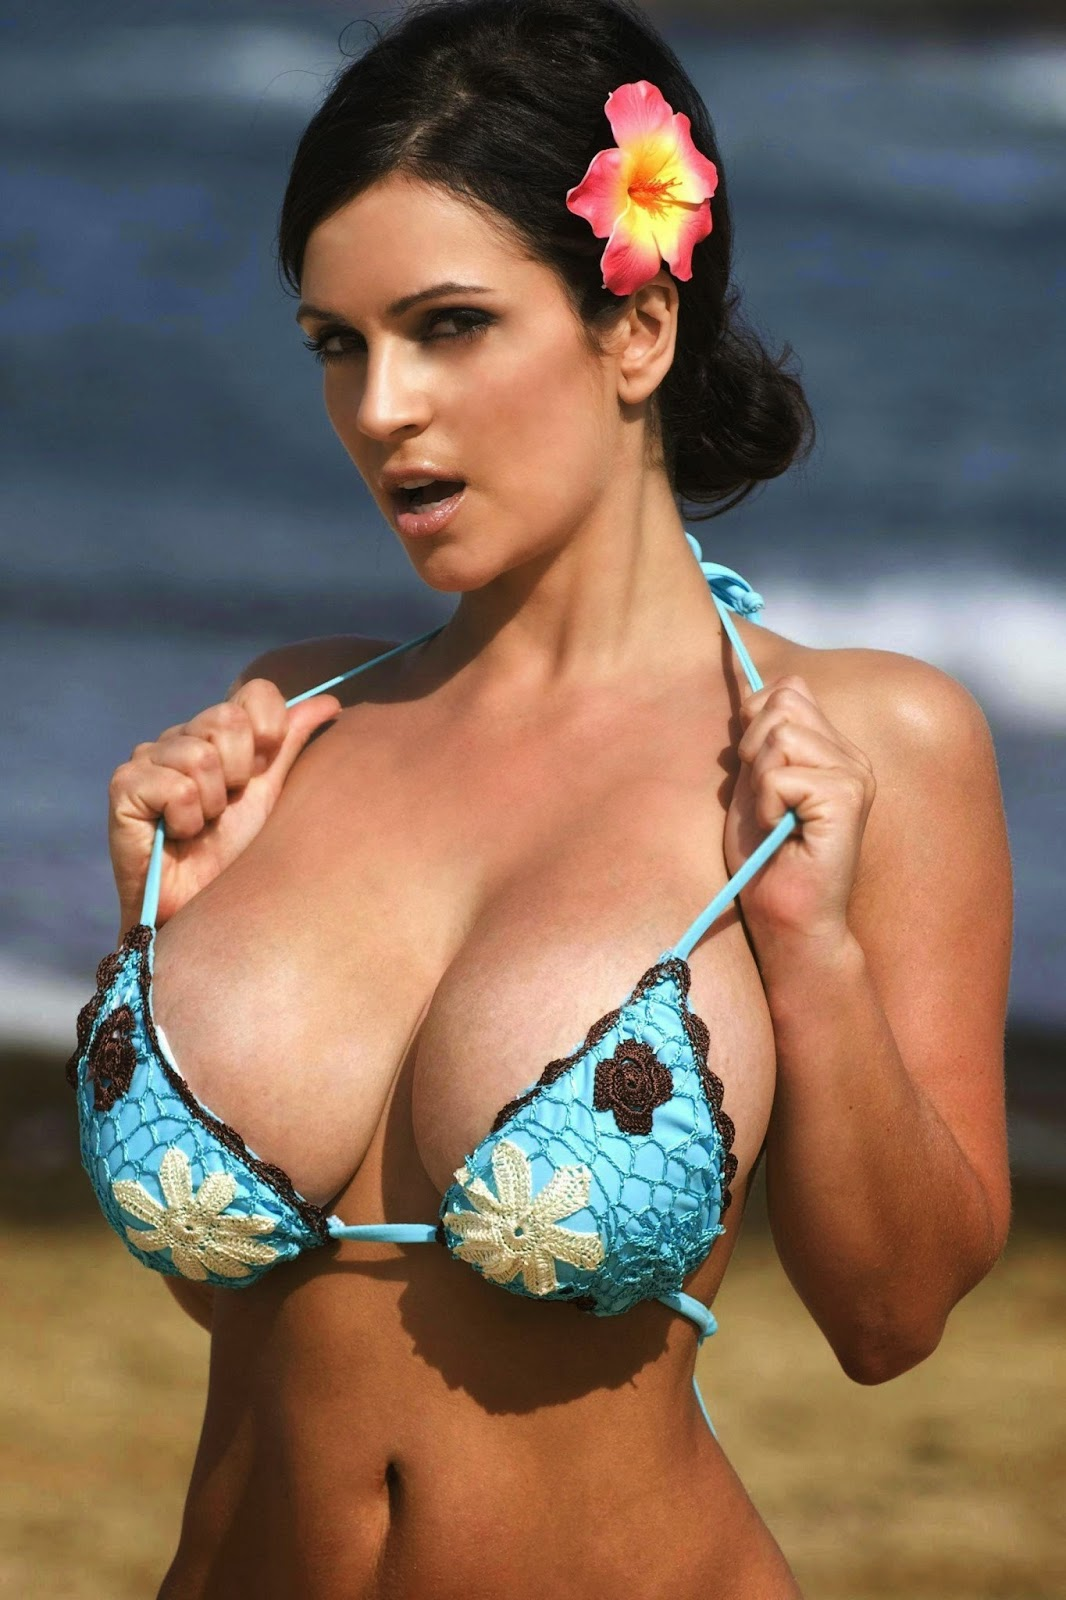 Spritzfreudige Biggest boob muscchi video